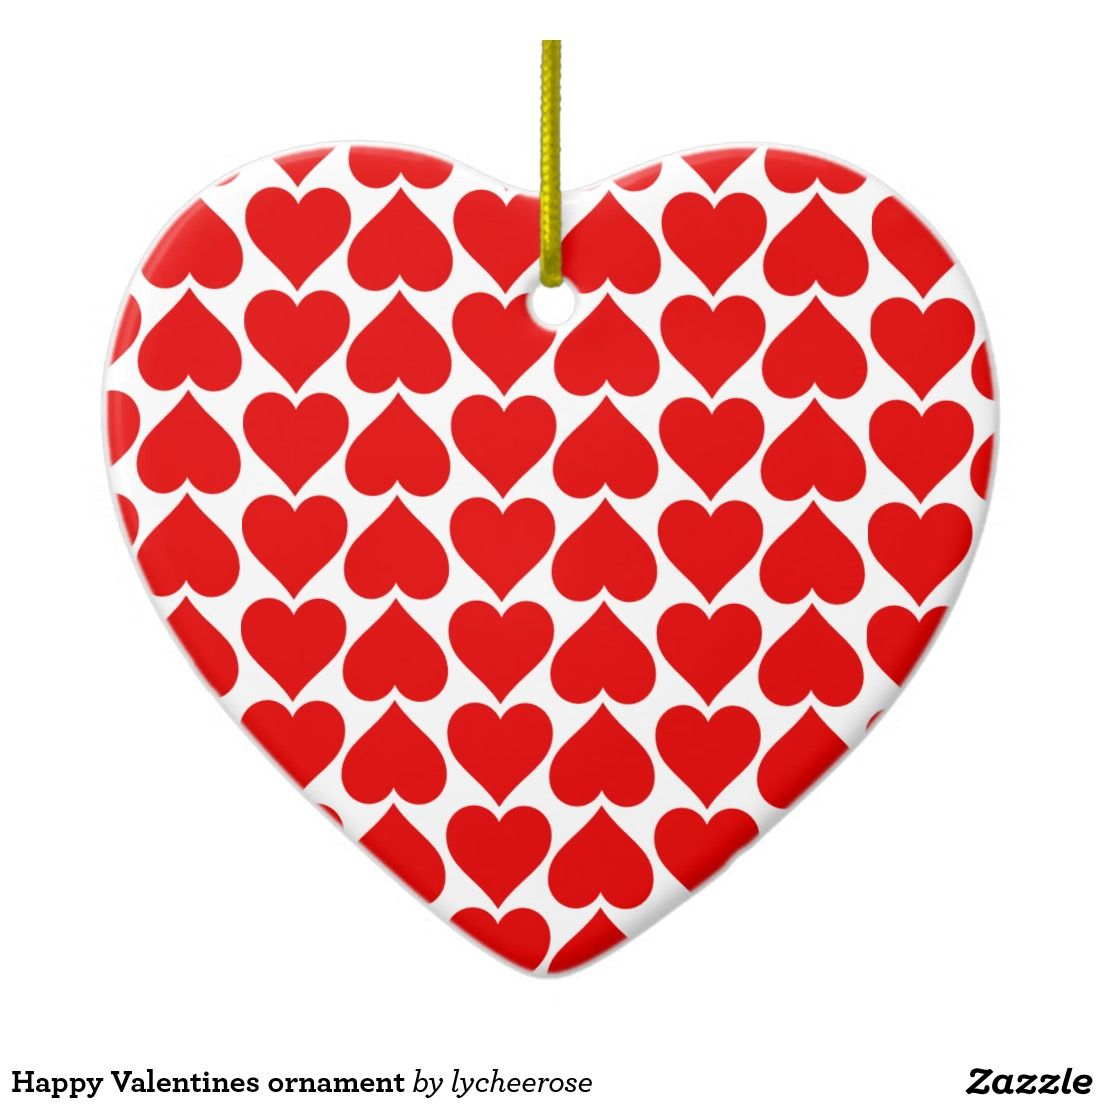 Happy Valentines ornament